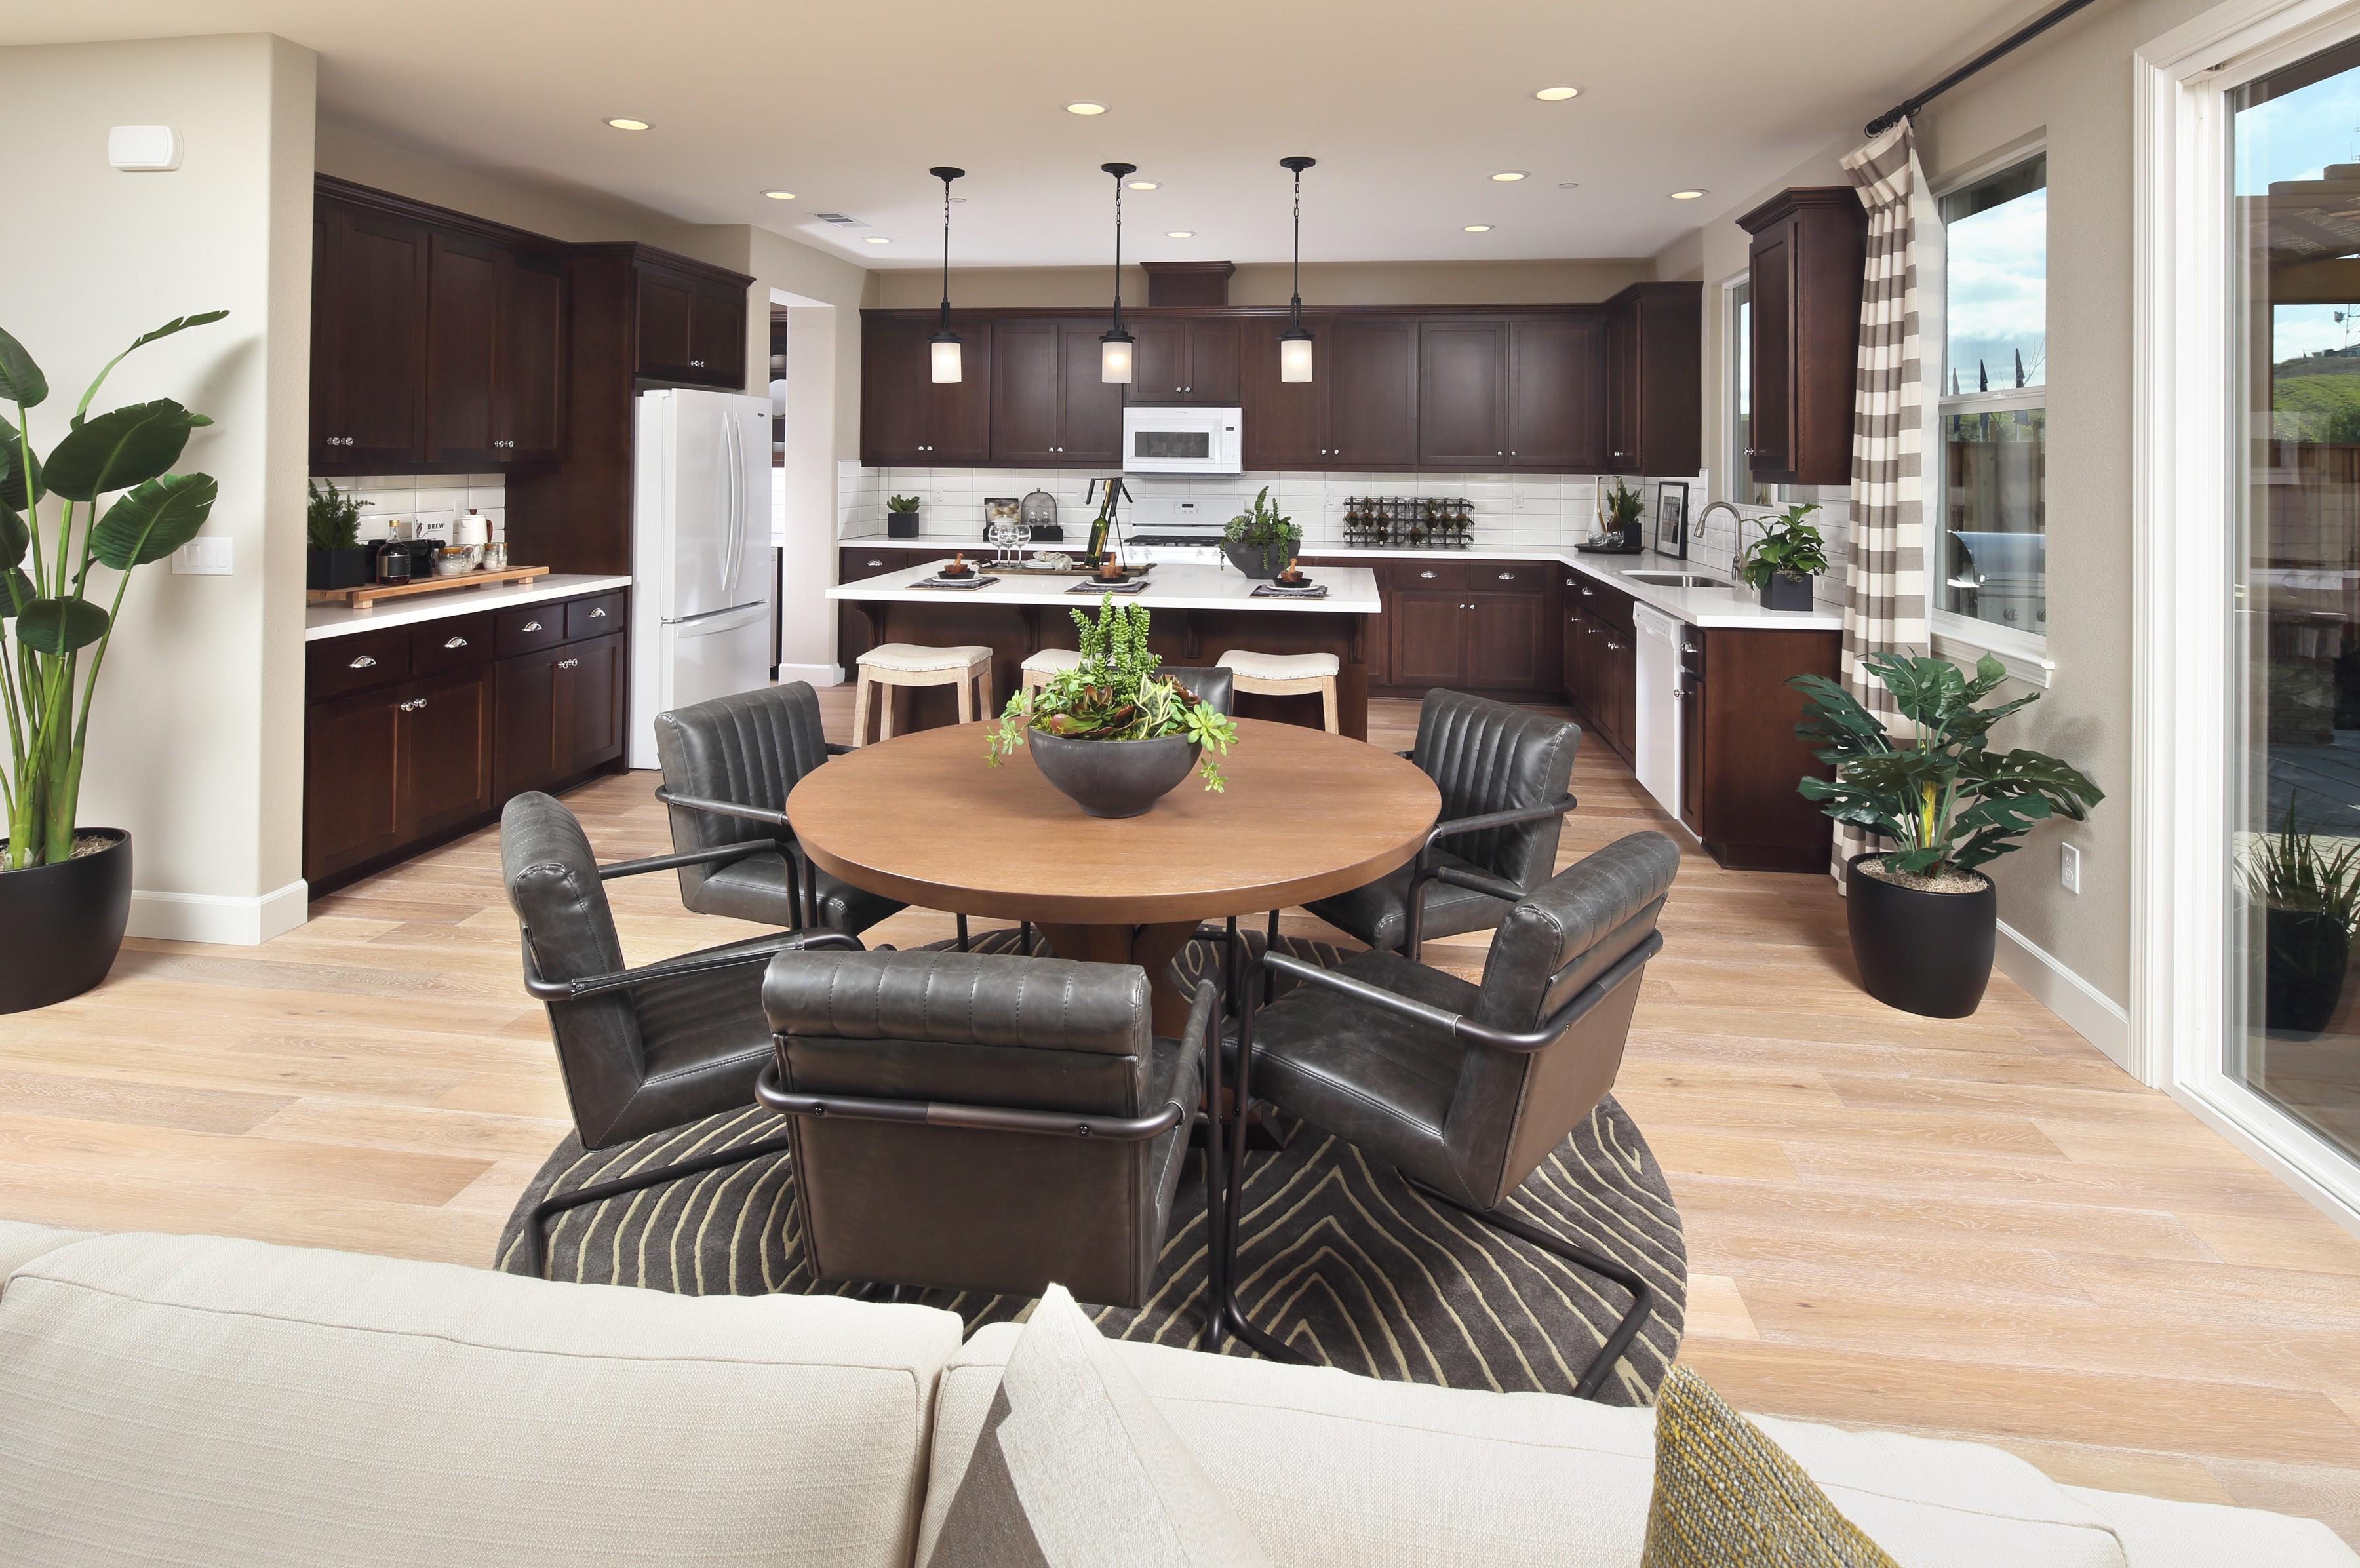 Traditional furniture   Elite Builder Services